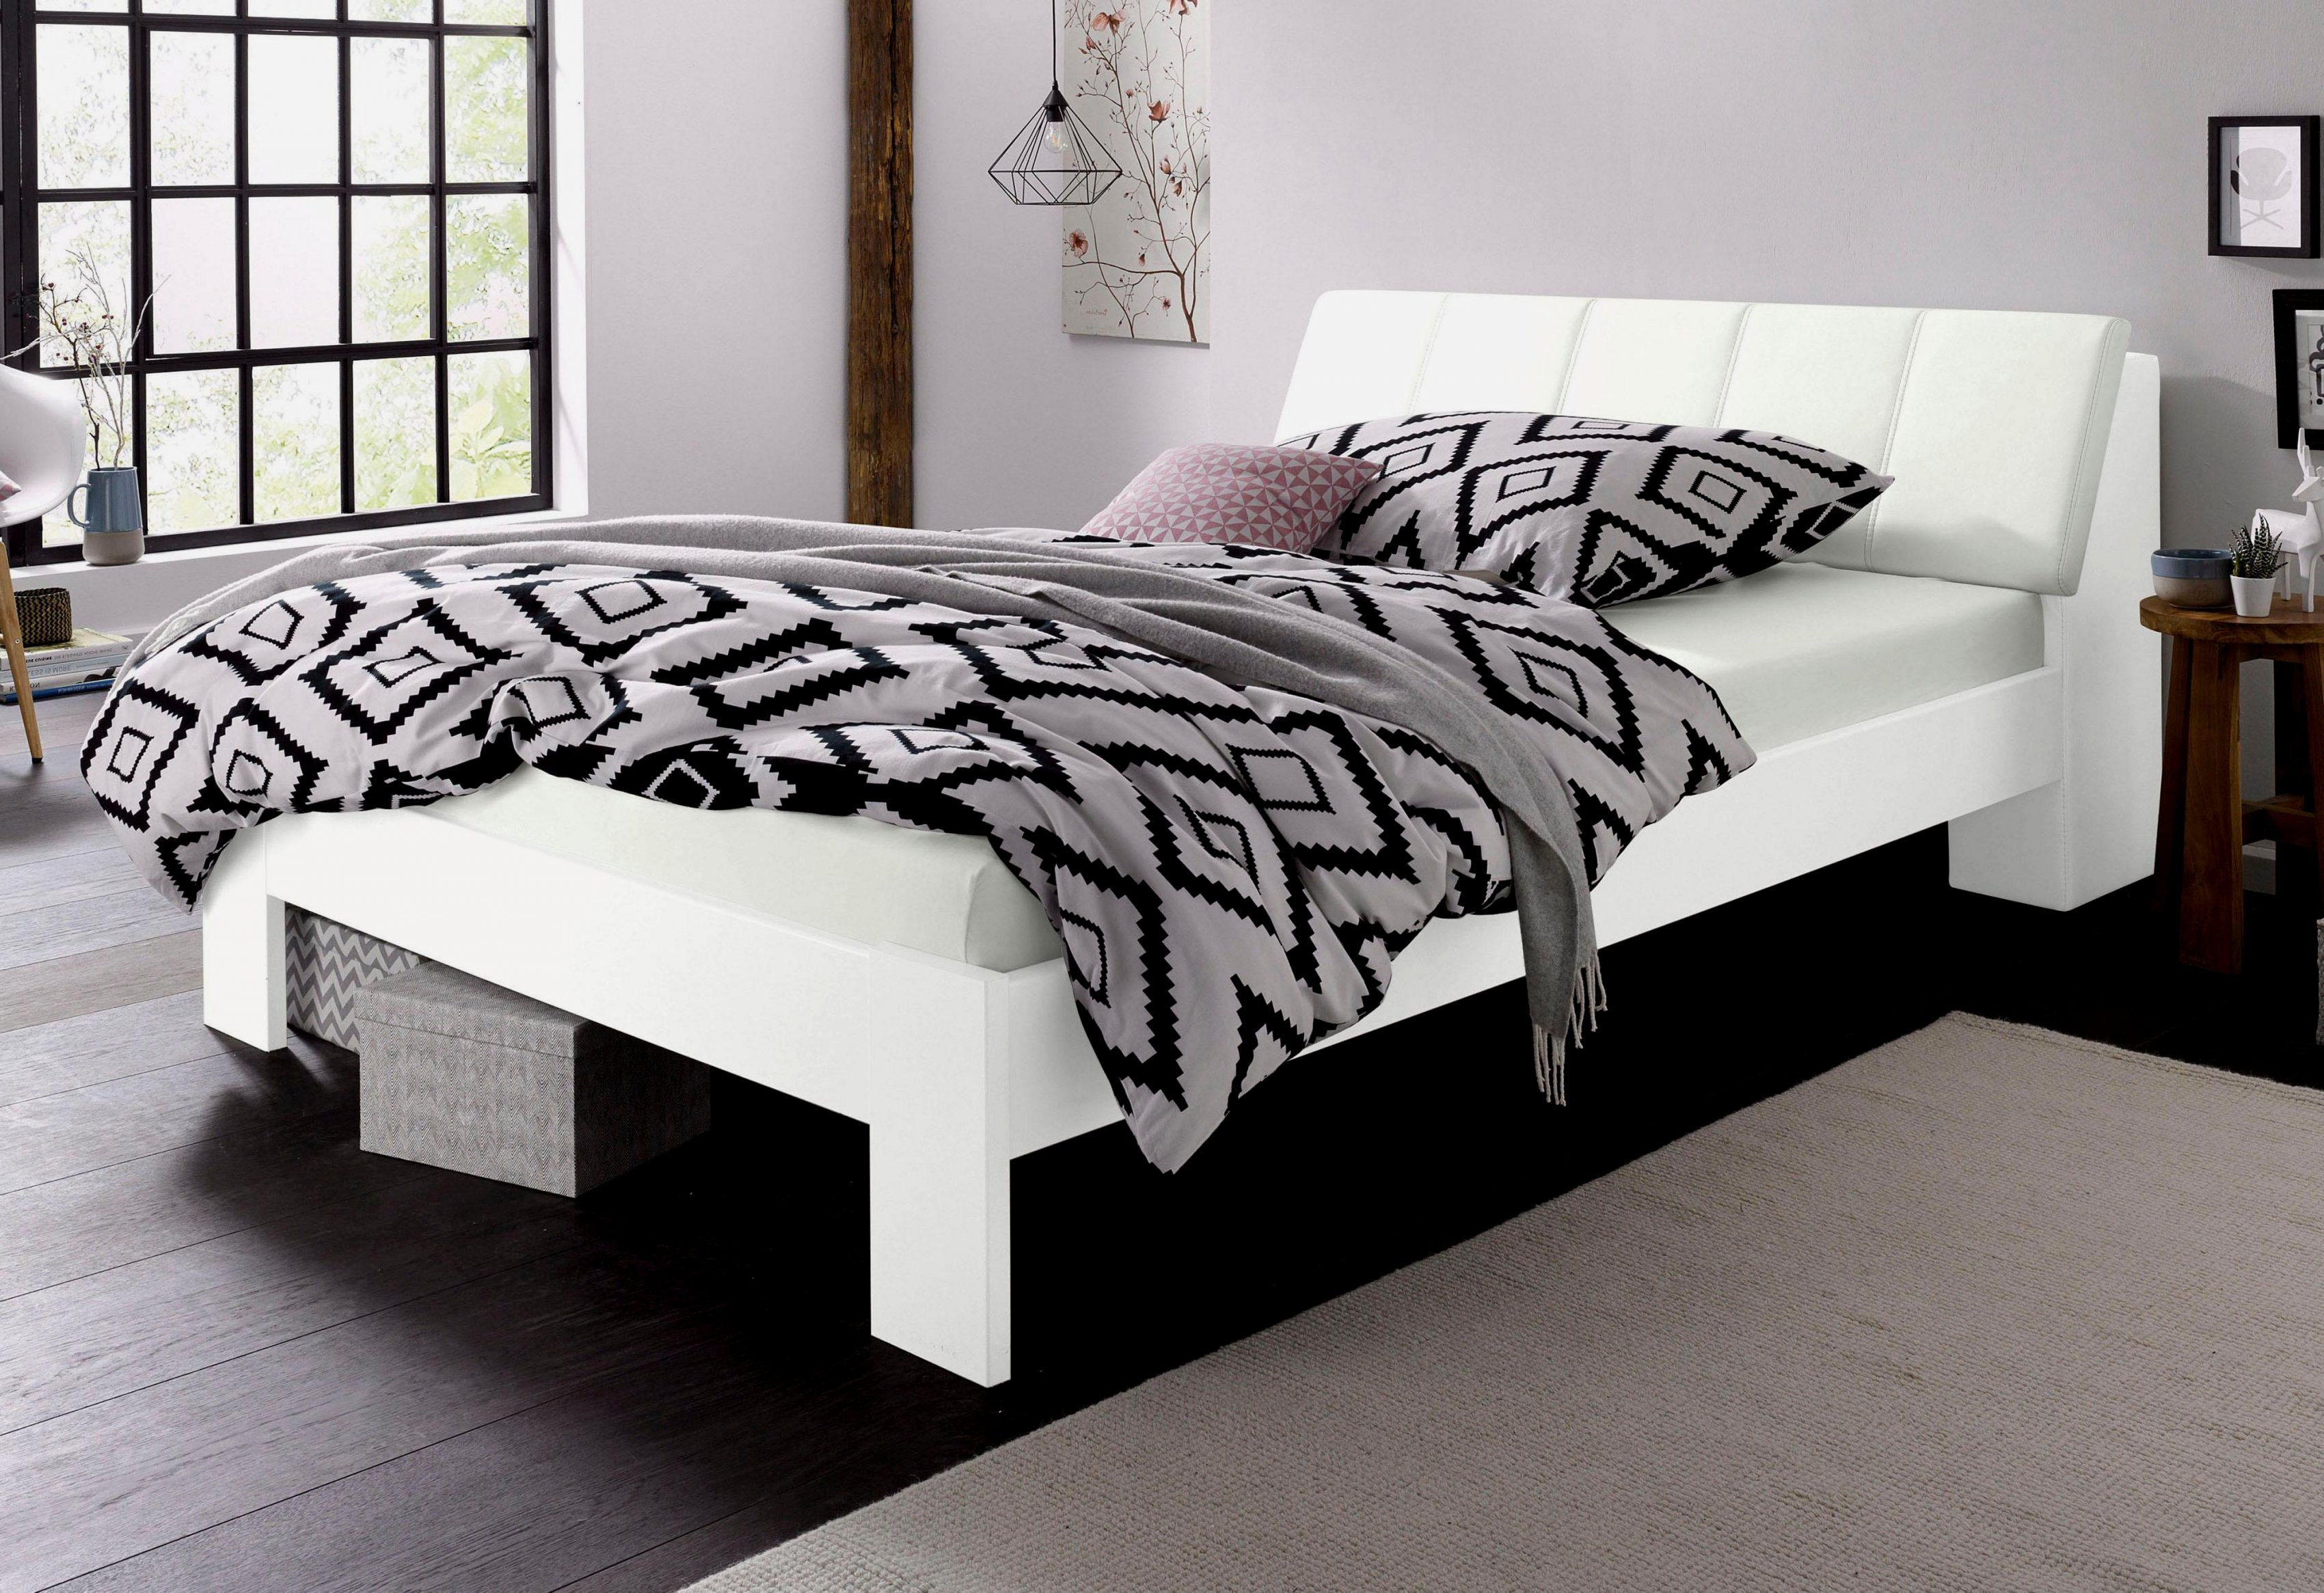 Atemberaubend Bett Zwei Matratzen Luxus Boxspringbett Mit Matratze von Bett Zwei Matratzen Photo